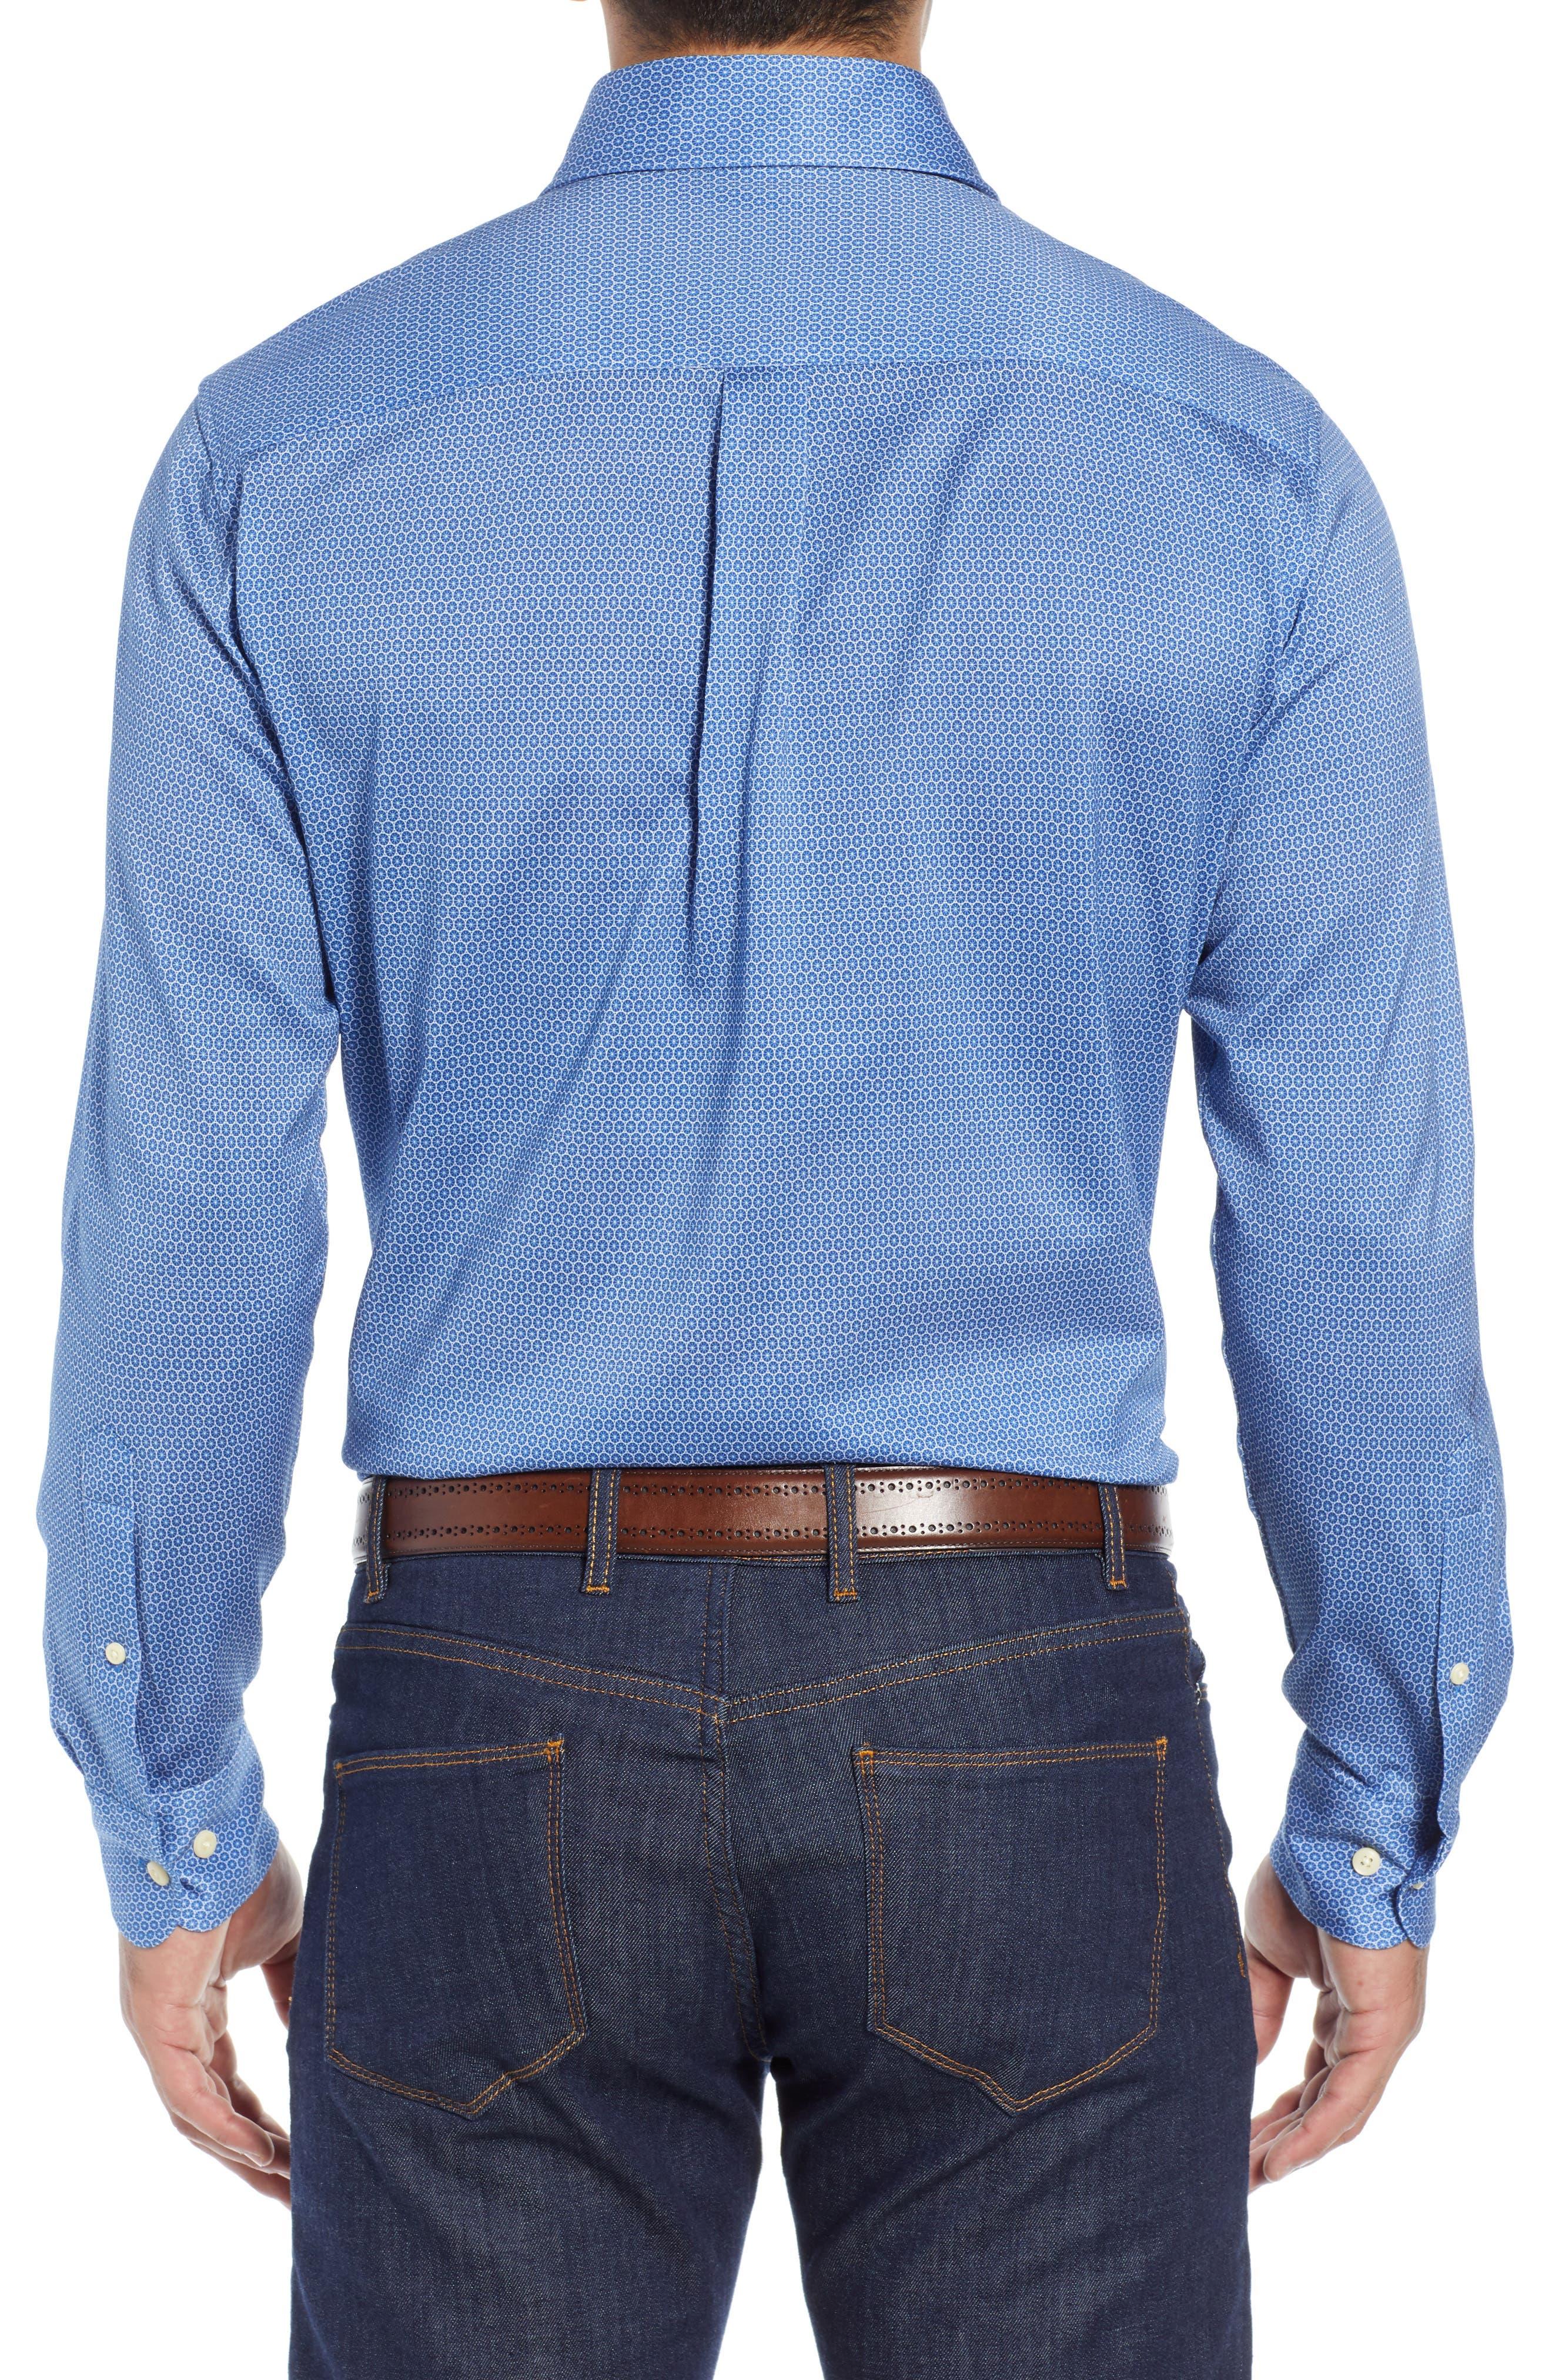 Schwinn Sport Shirt,                             Alternate thumbnail 3, color,                             PLAZA BLUE